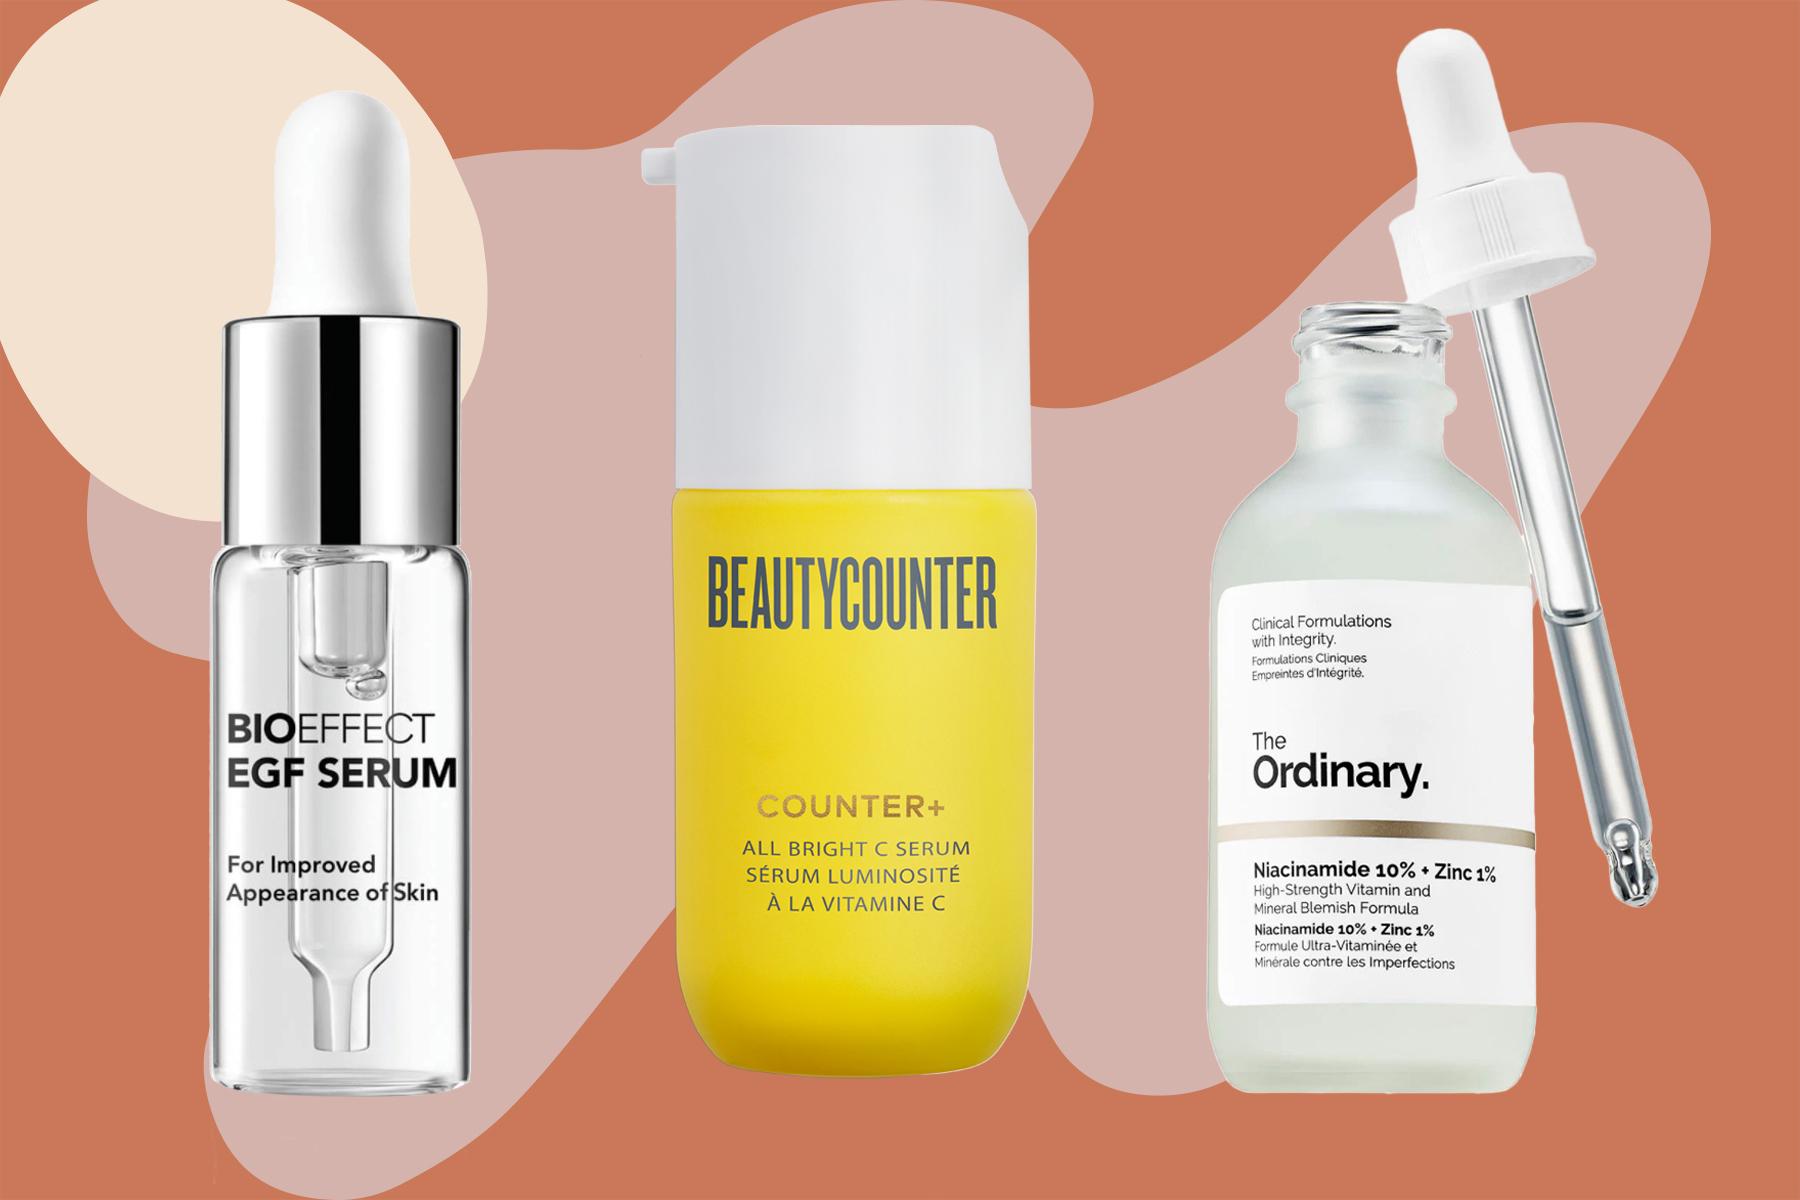 retinol alternative ingredients skincare products